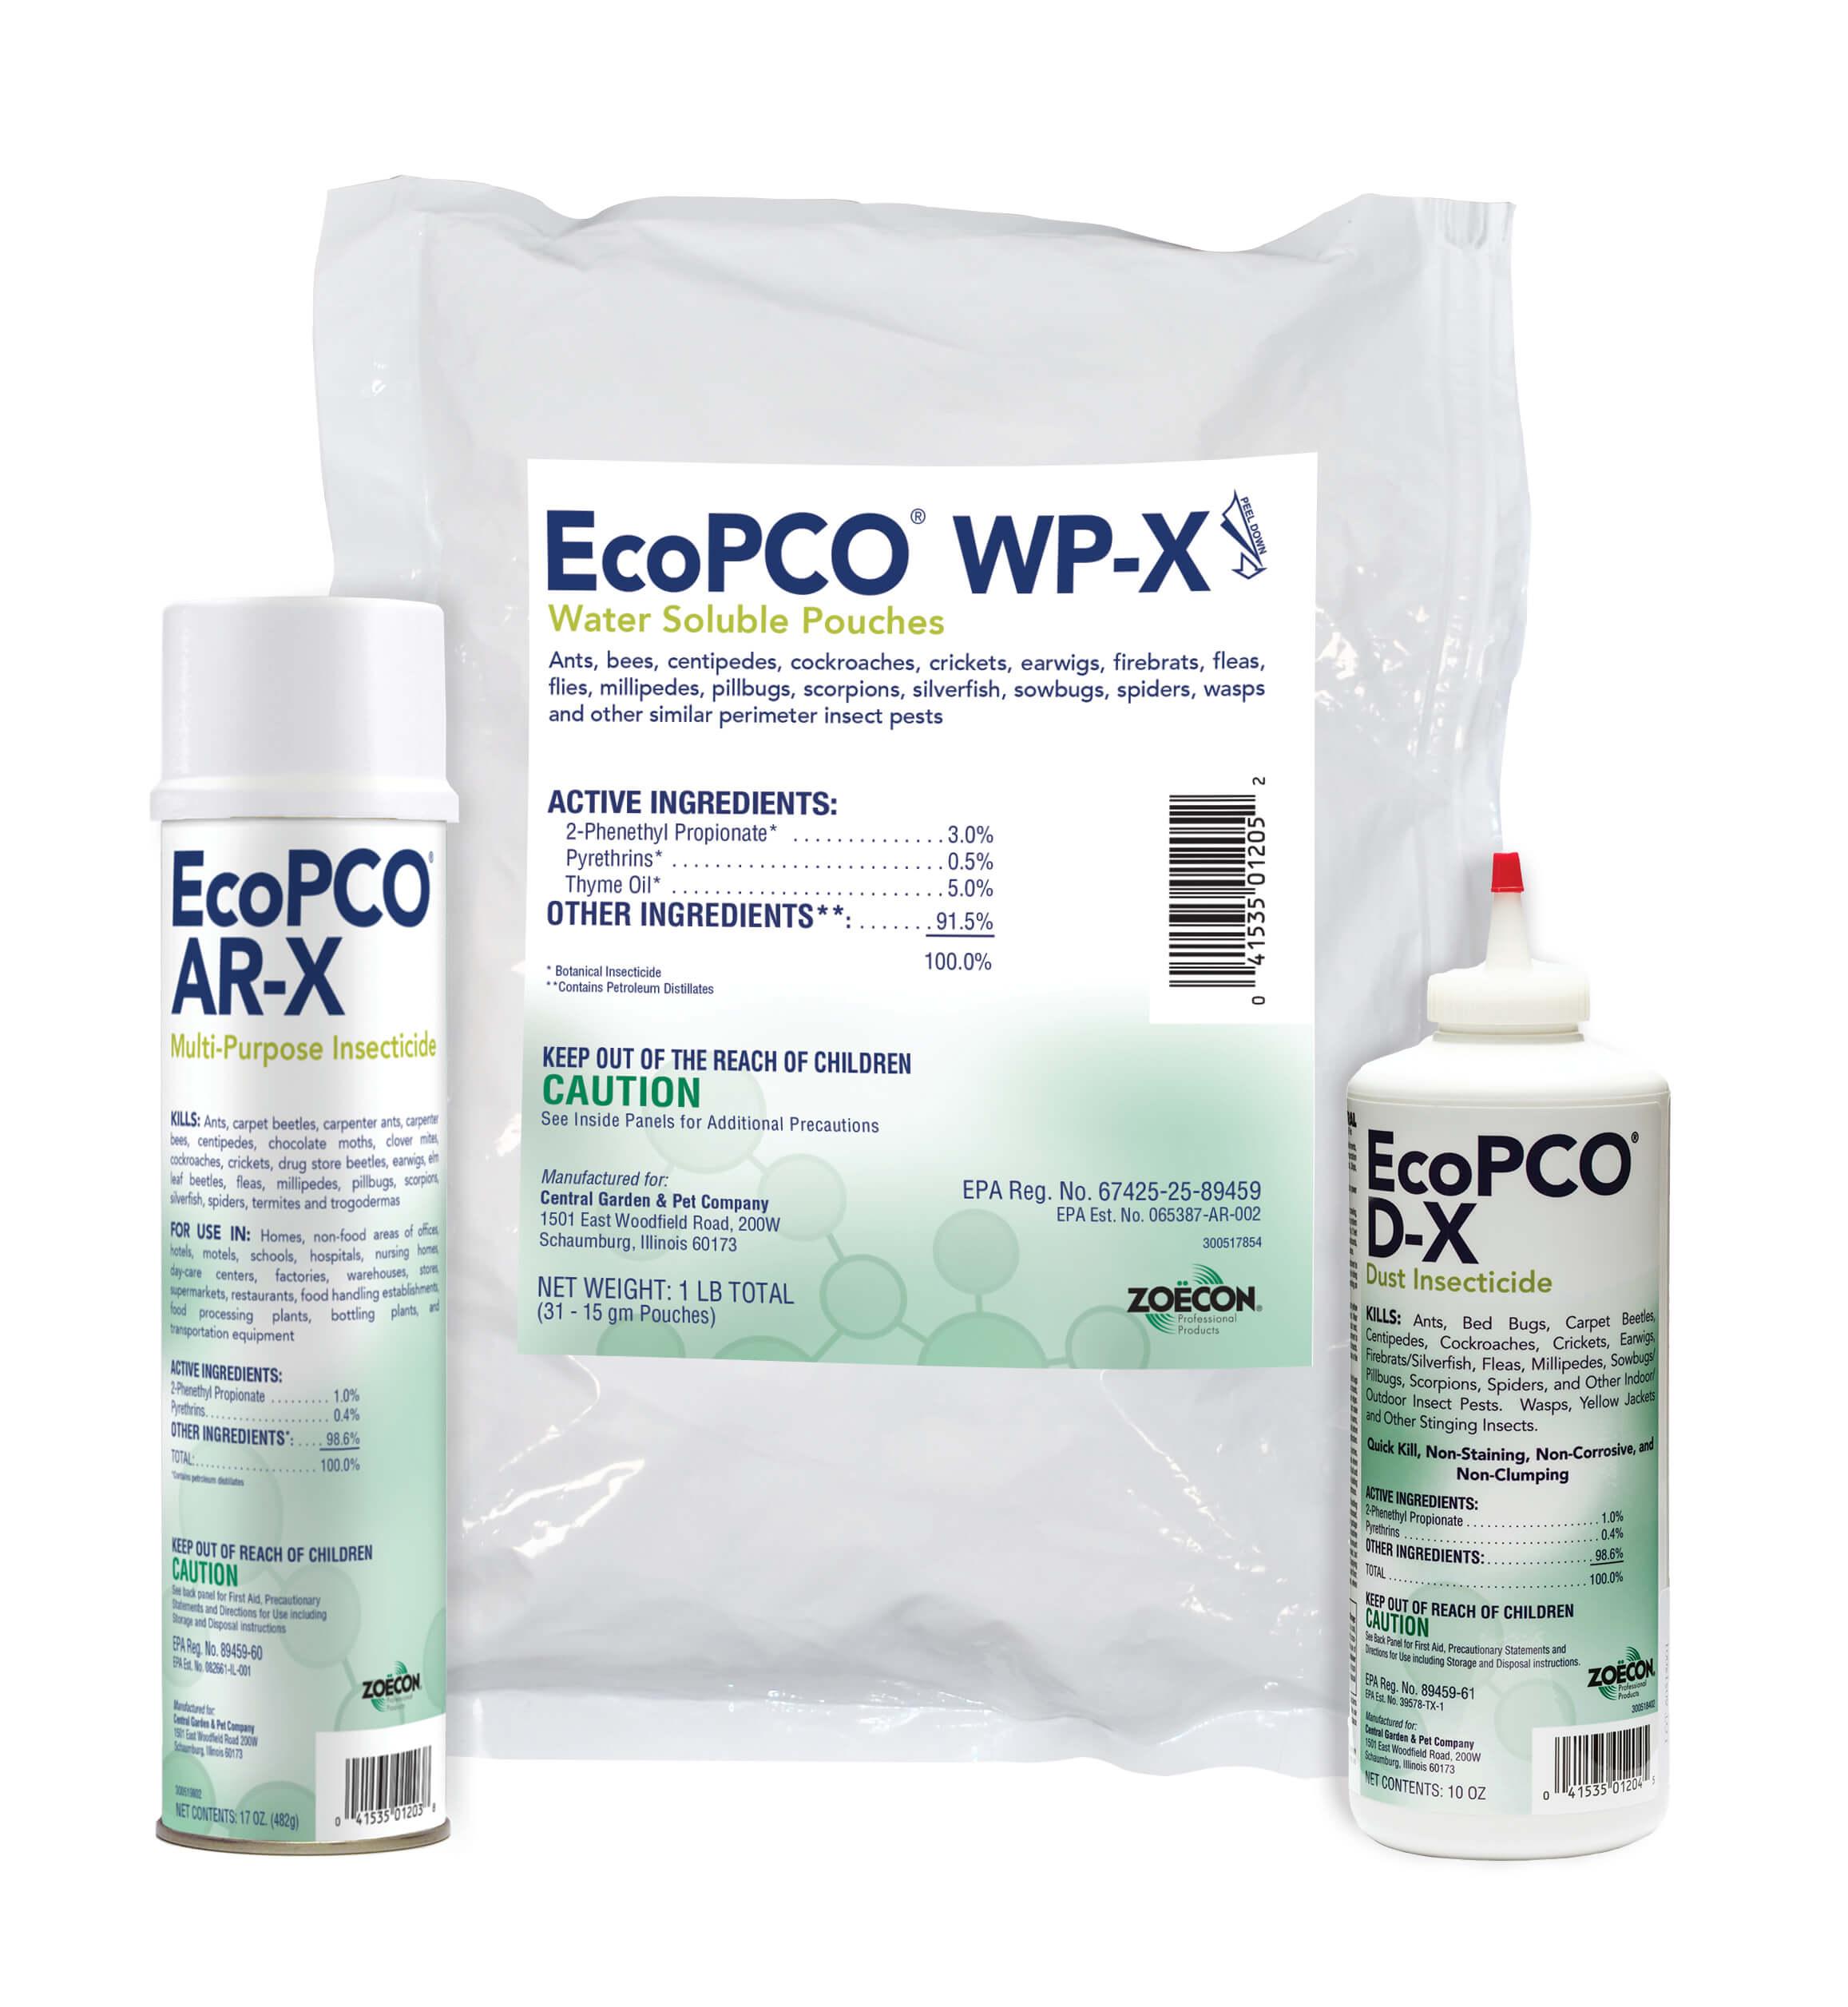 EcoPCO_WPX_ARX_DX (1).jpg